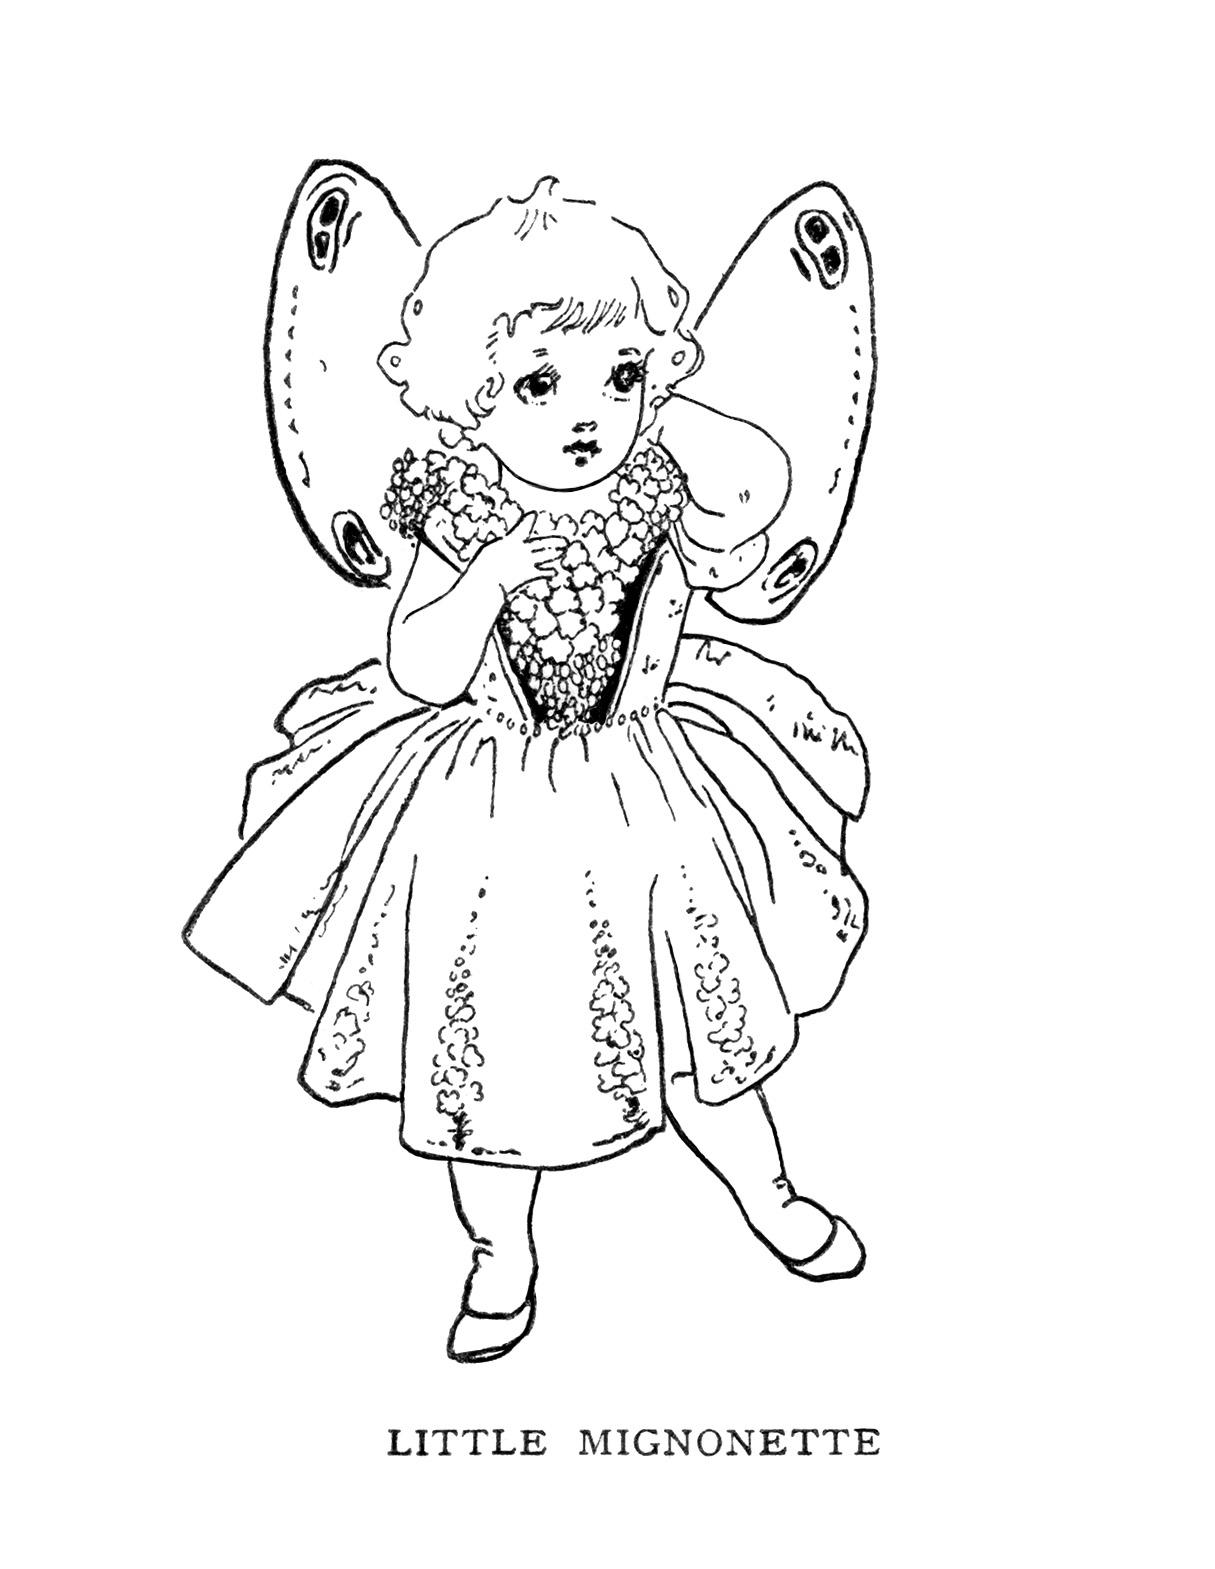 Free Vintage Image Little Mignonette Storybook Character